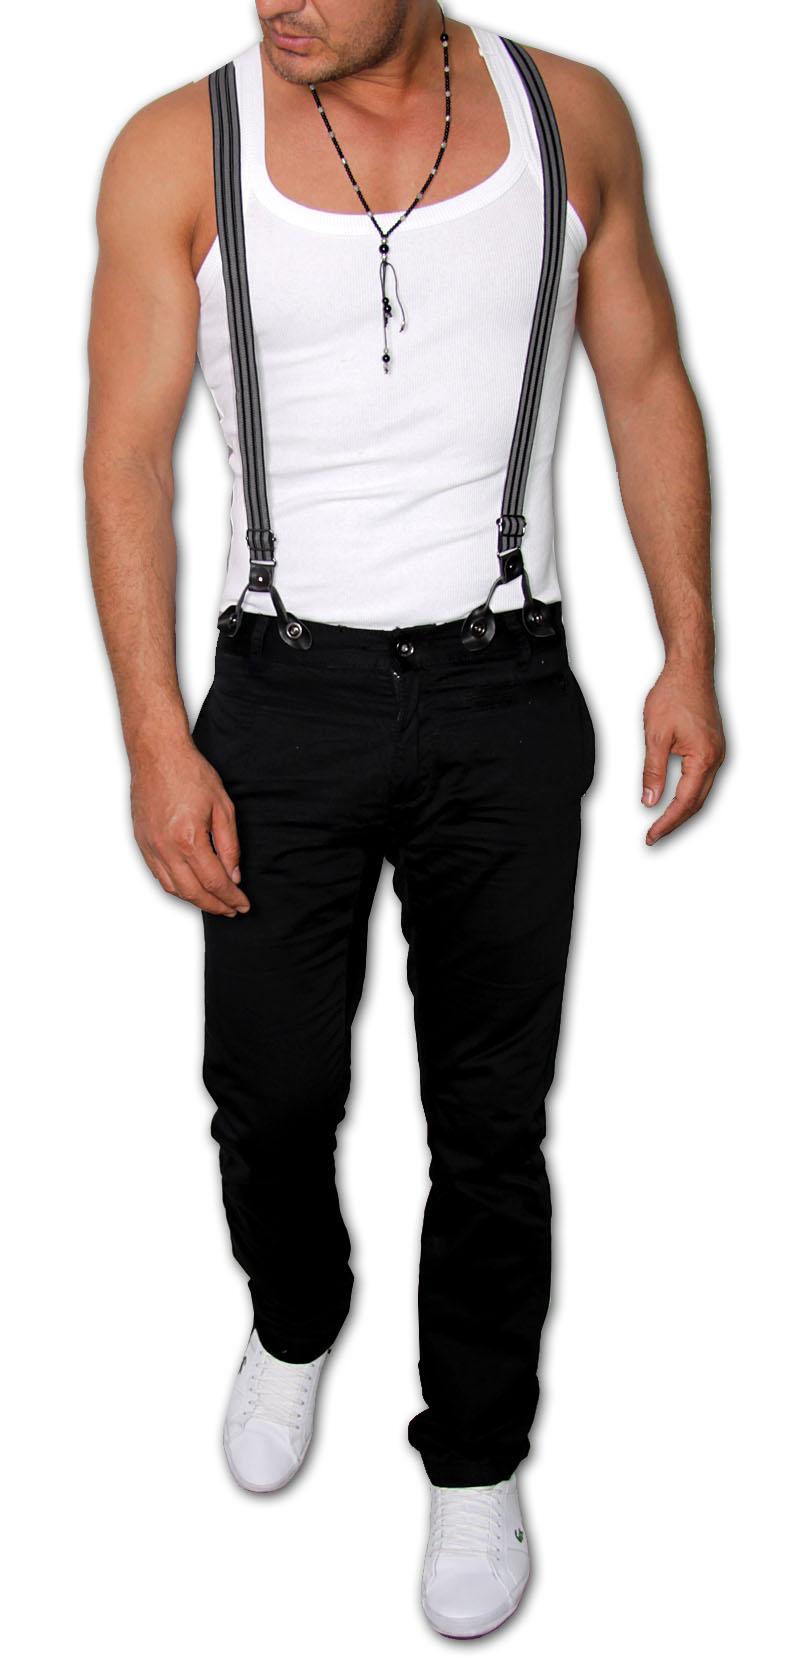 neu chino hose hosentr ger herren hose trousers jeans w29 bis w36 k752 4. Black Bedroom Furniture Sets. Home Design Ideas